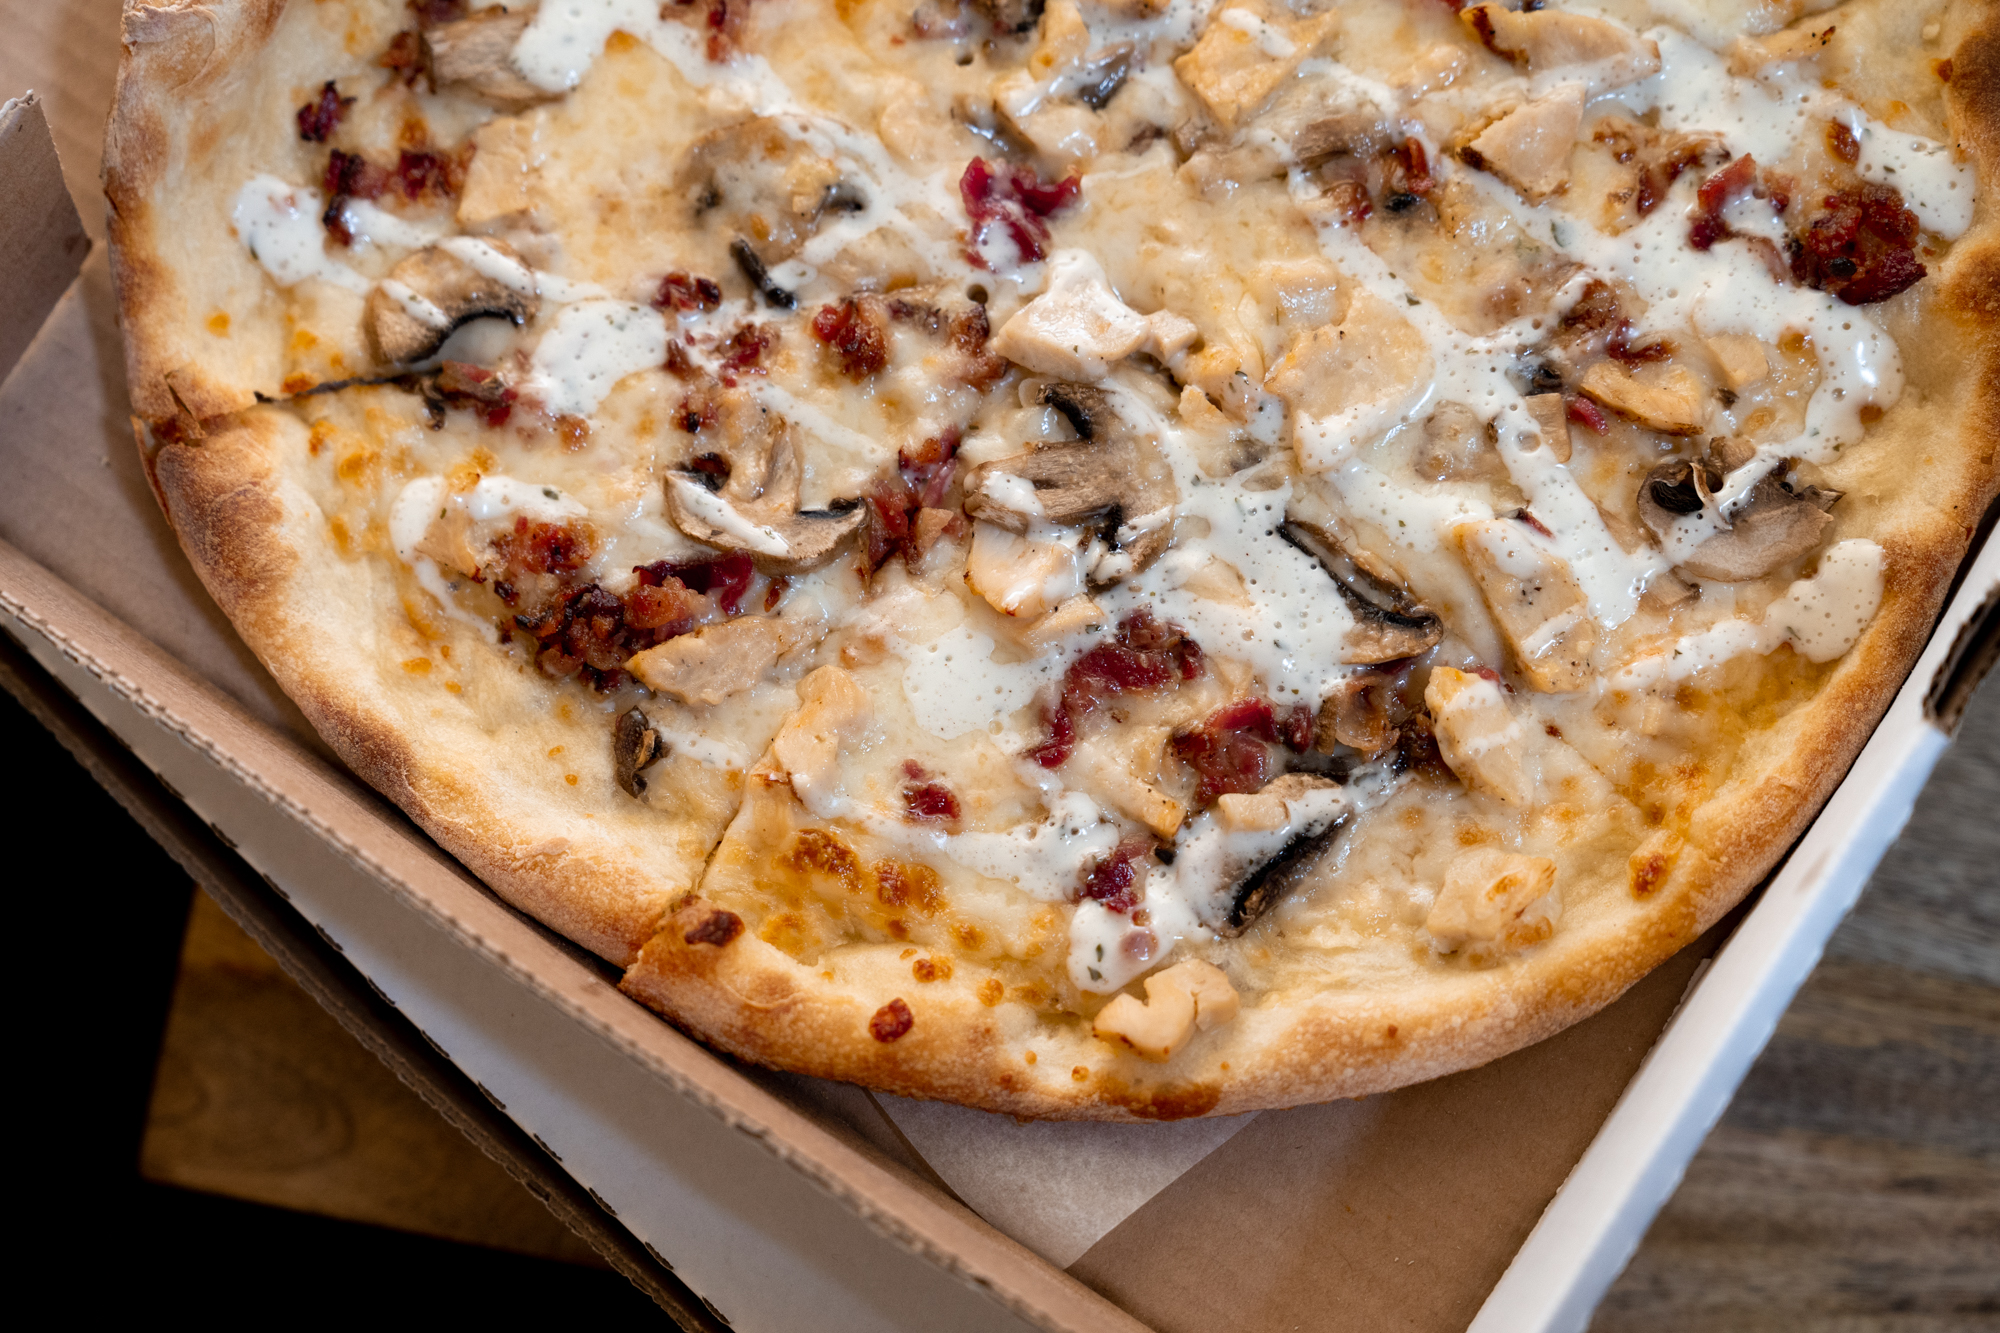 arte-pizzeria-loveland-rustica-pizza-chelsea-delanie-photography.jpg